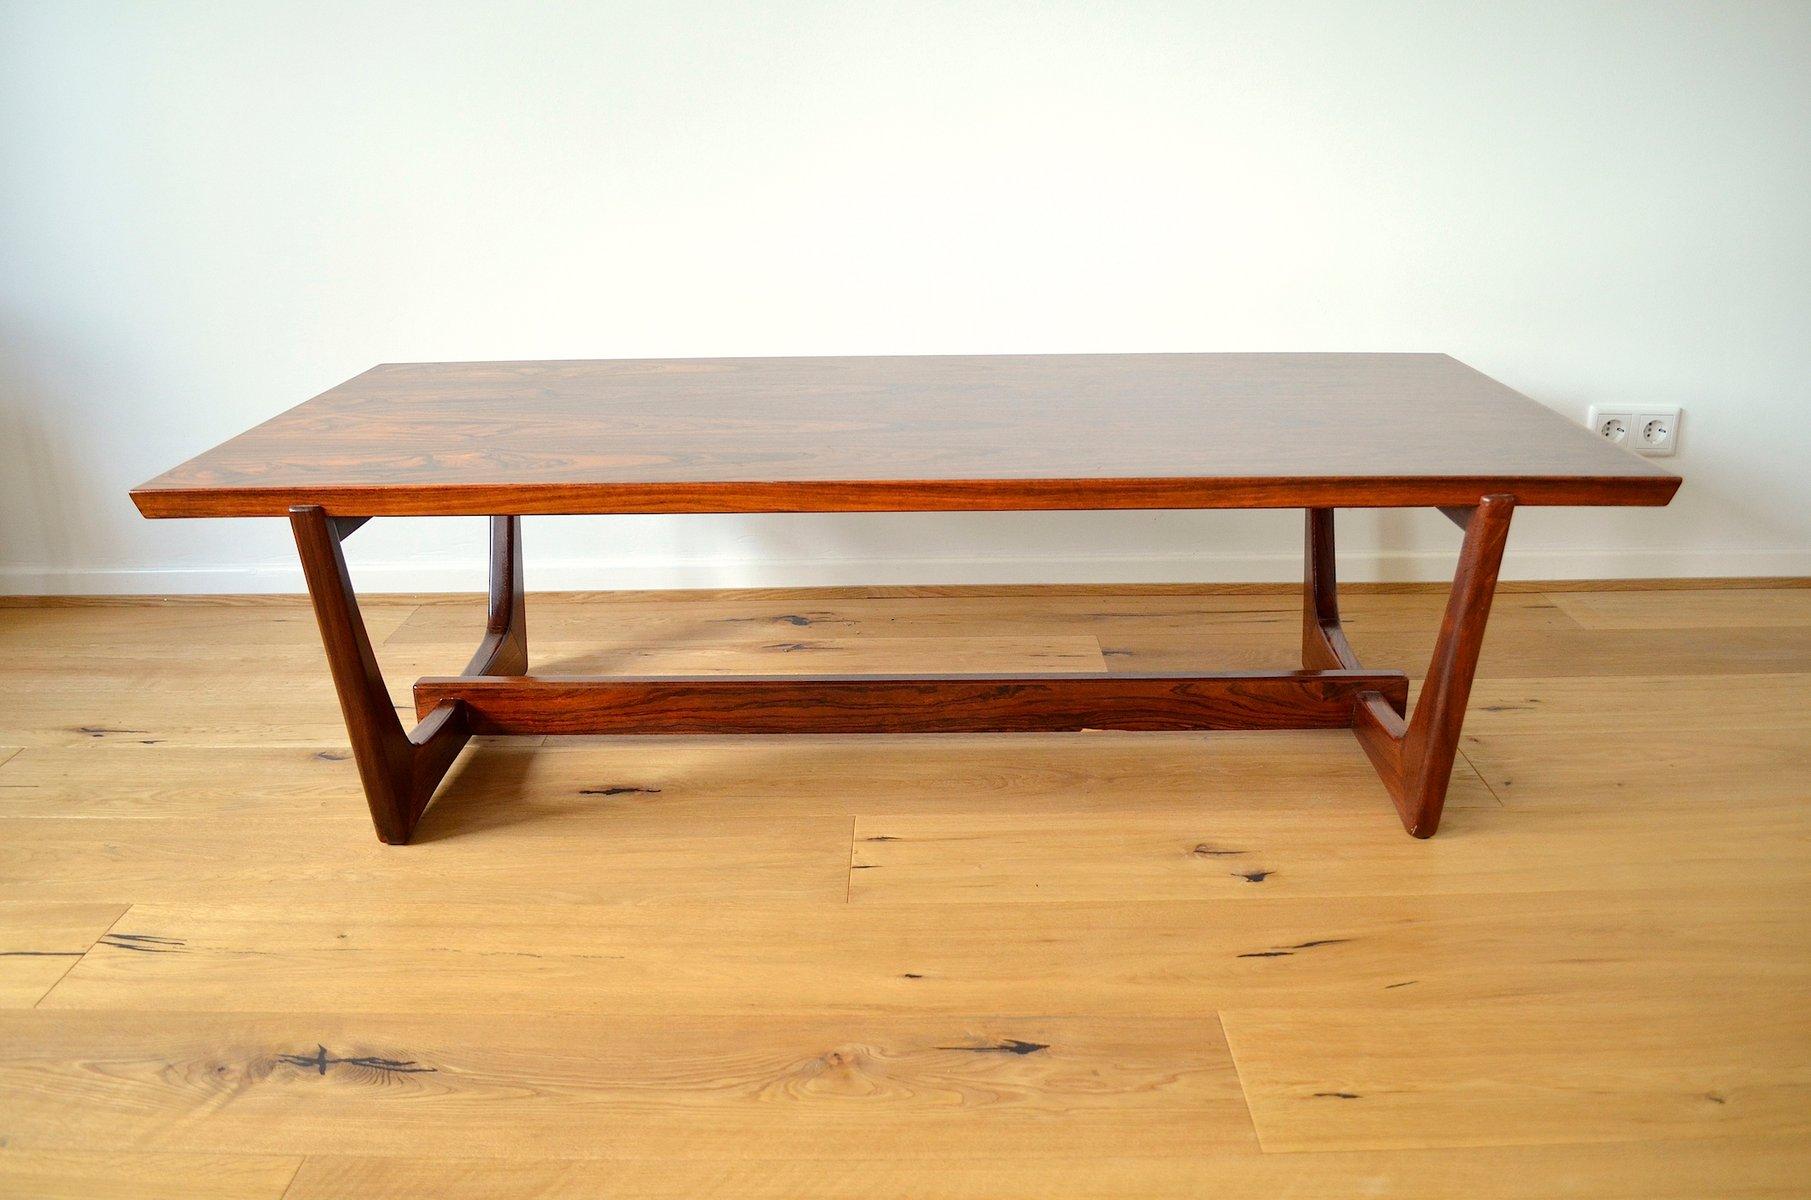 skandinavischer rio palisander furnier couchtisch 1960er. Black Bedroom Furniture Sets. Home Design Ideas